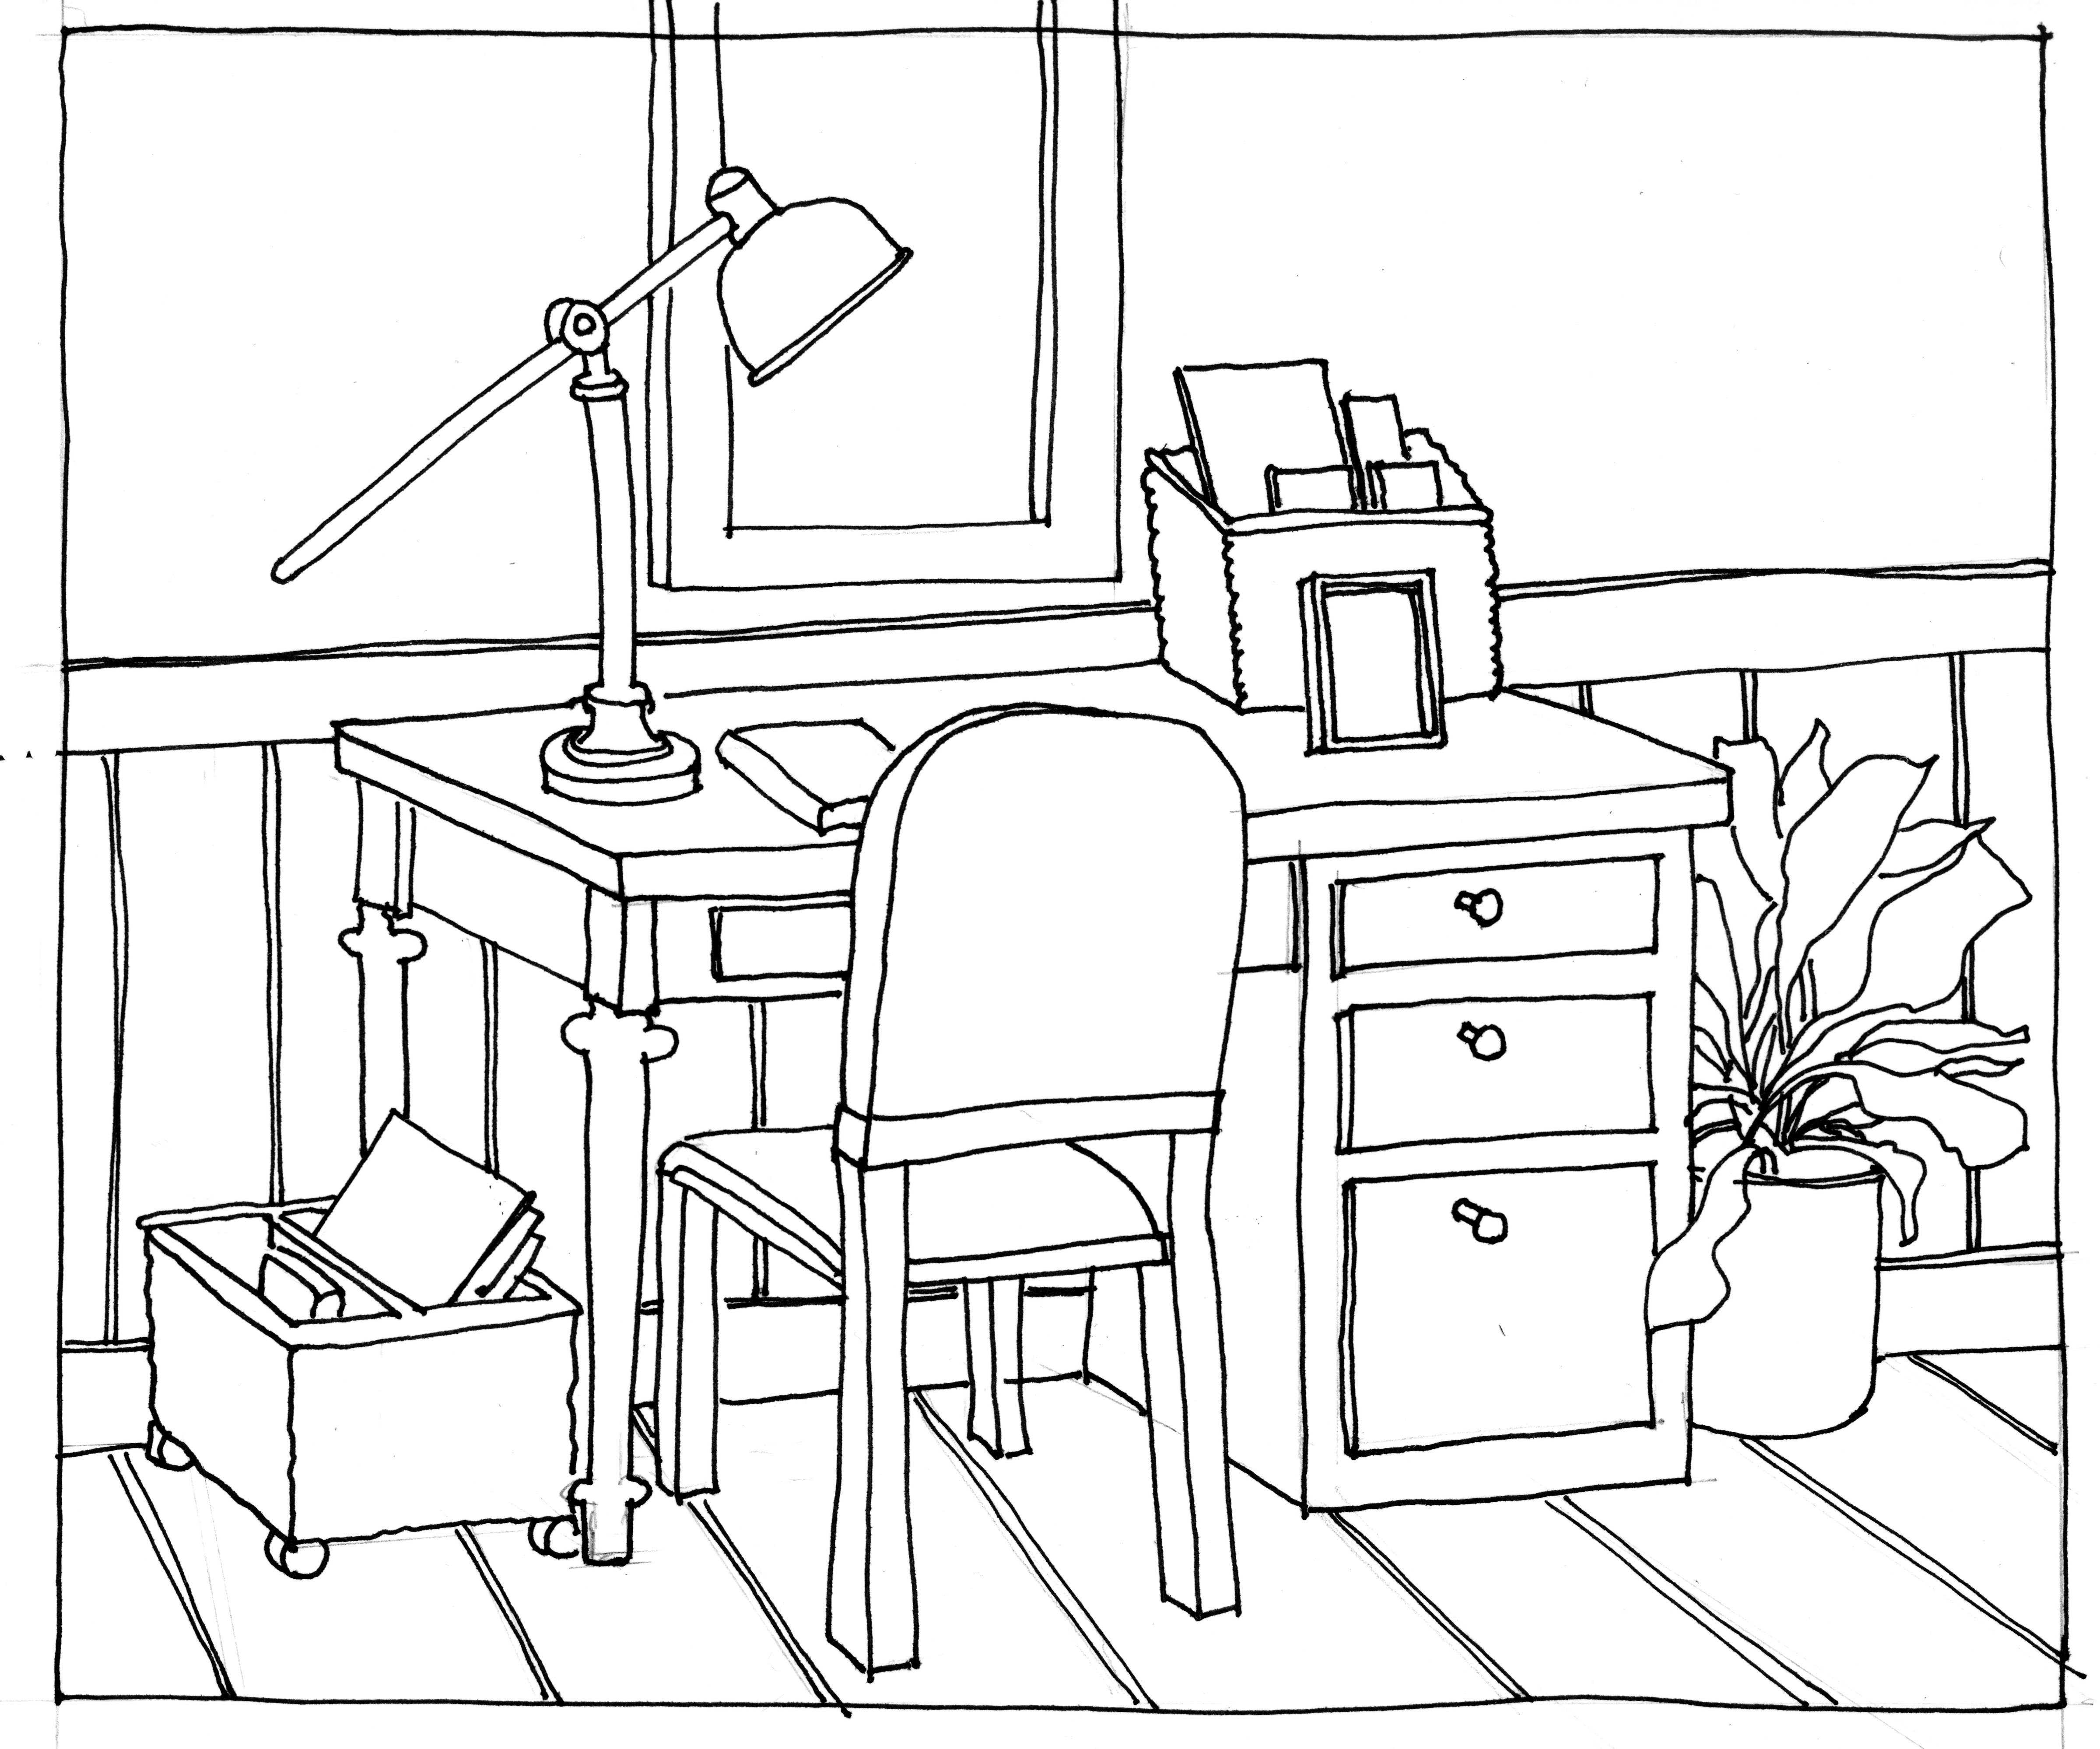 4799x3997 Brilliant School Chair Drawing Desk Man Thinking Sitting Office